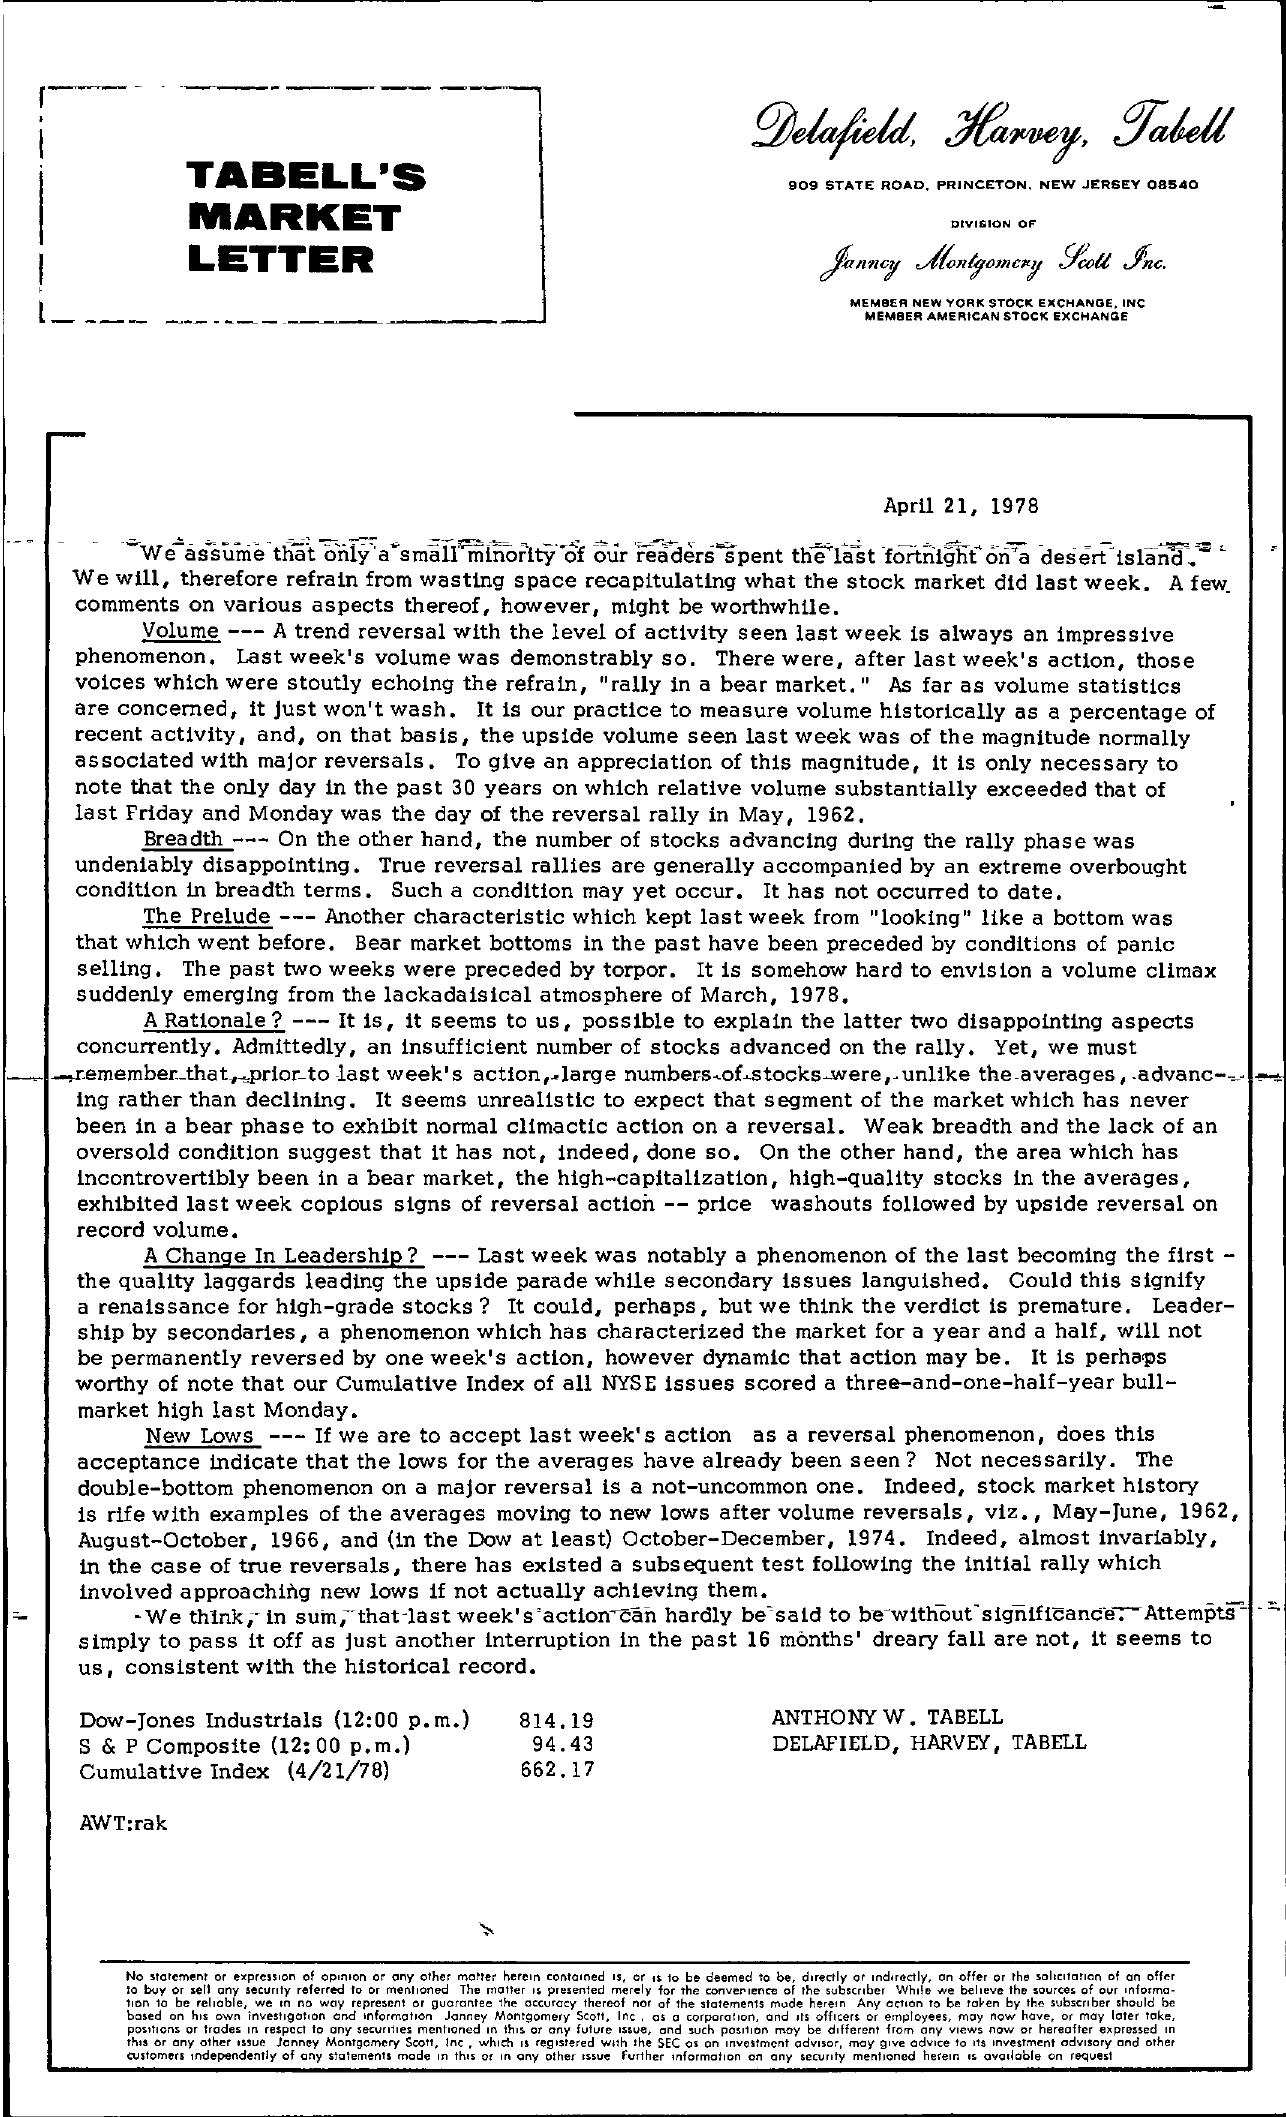 Tabell's Market Letter - April 21, 1978